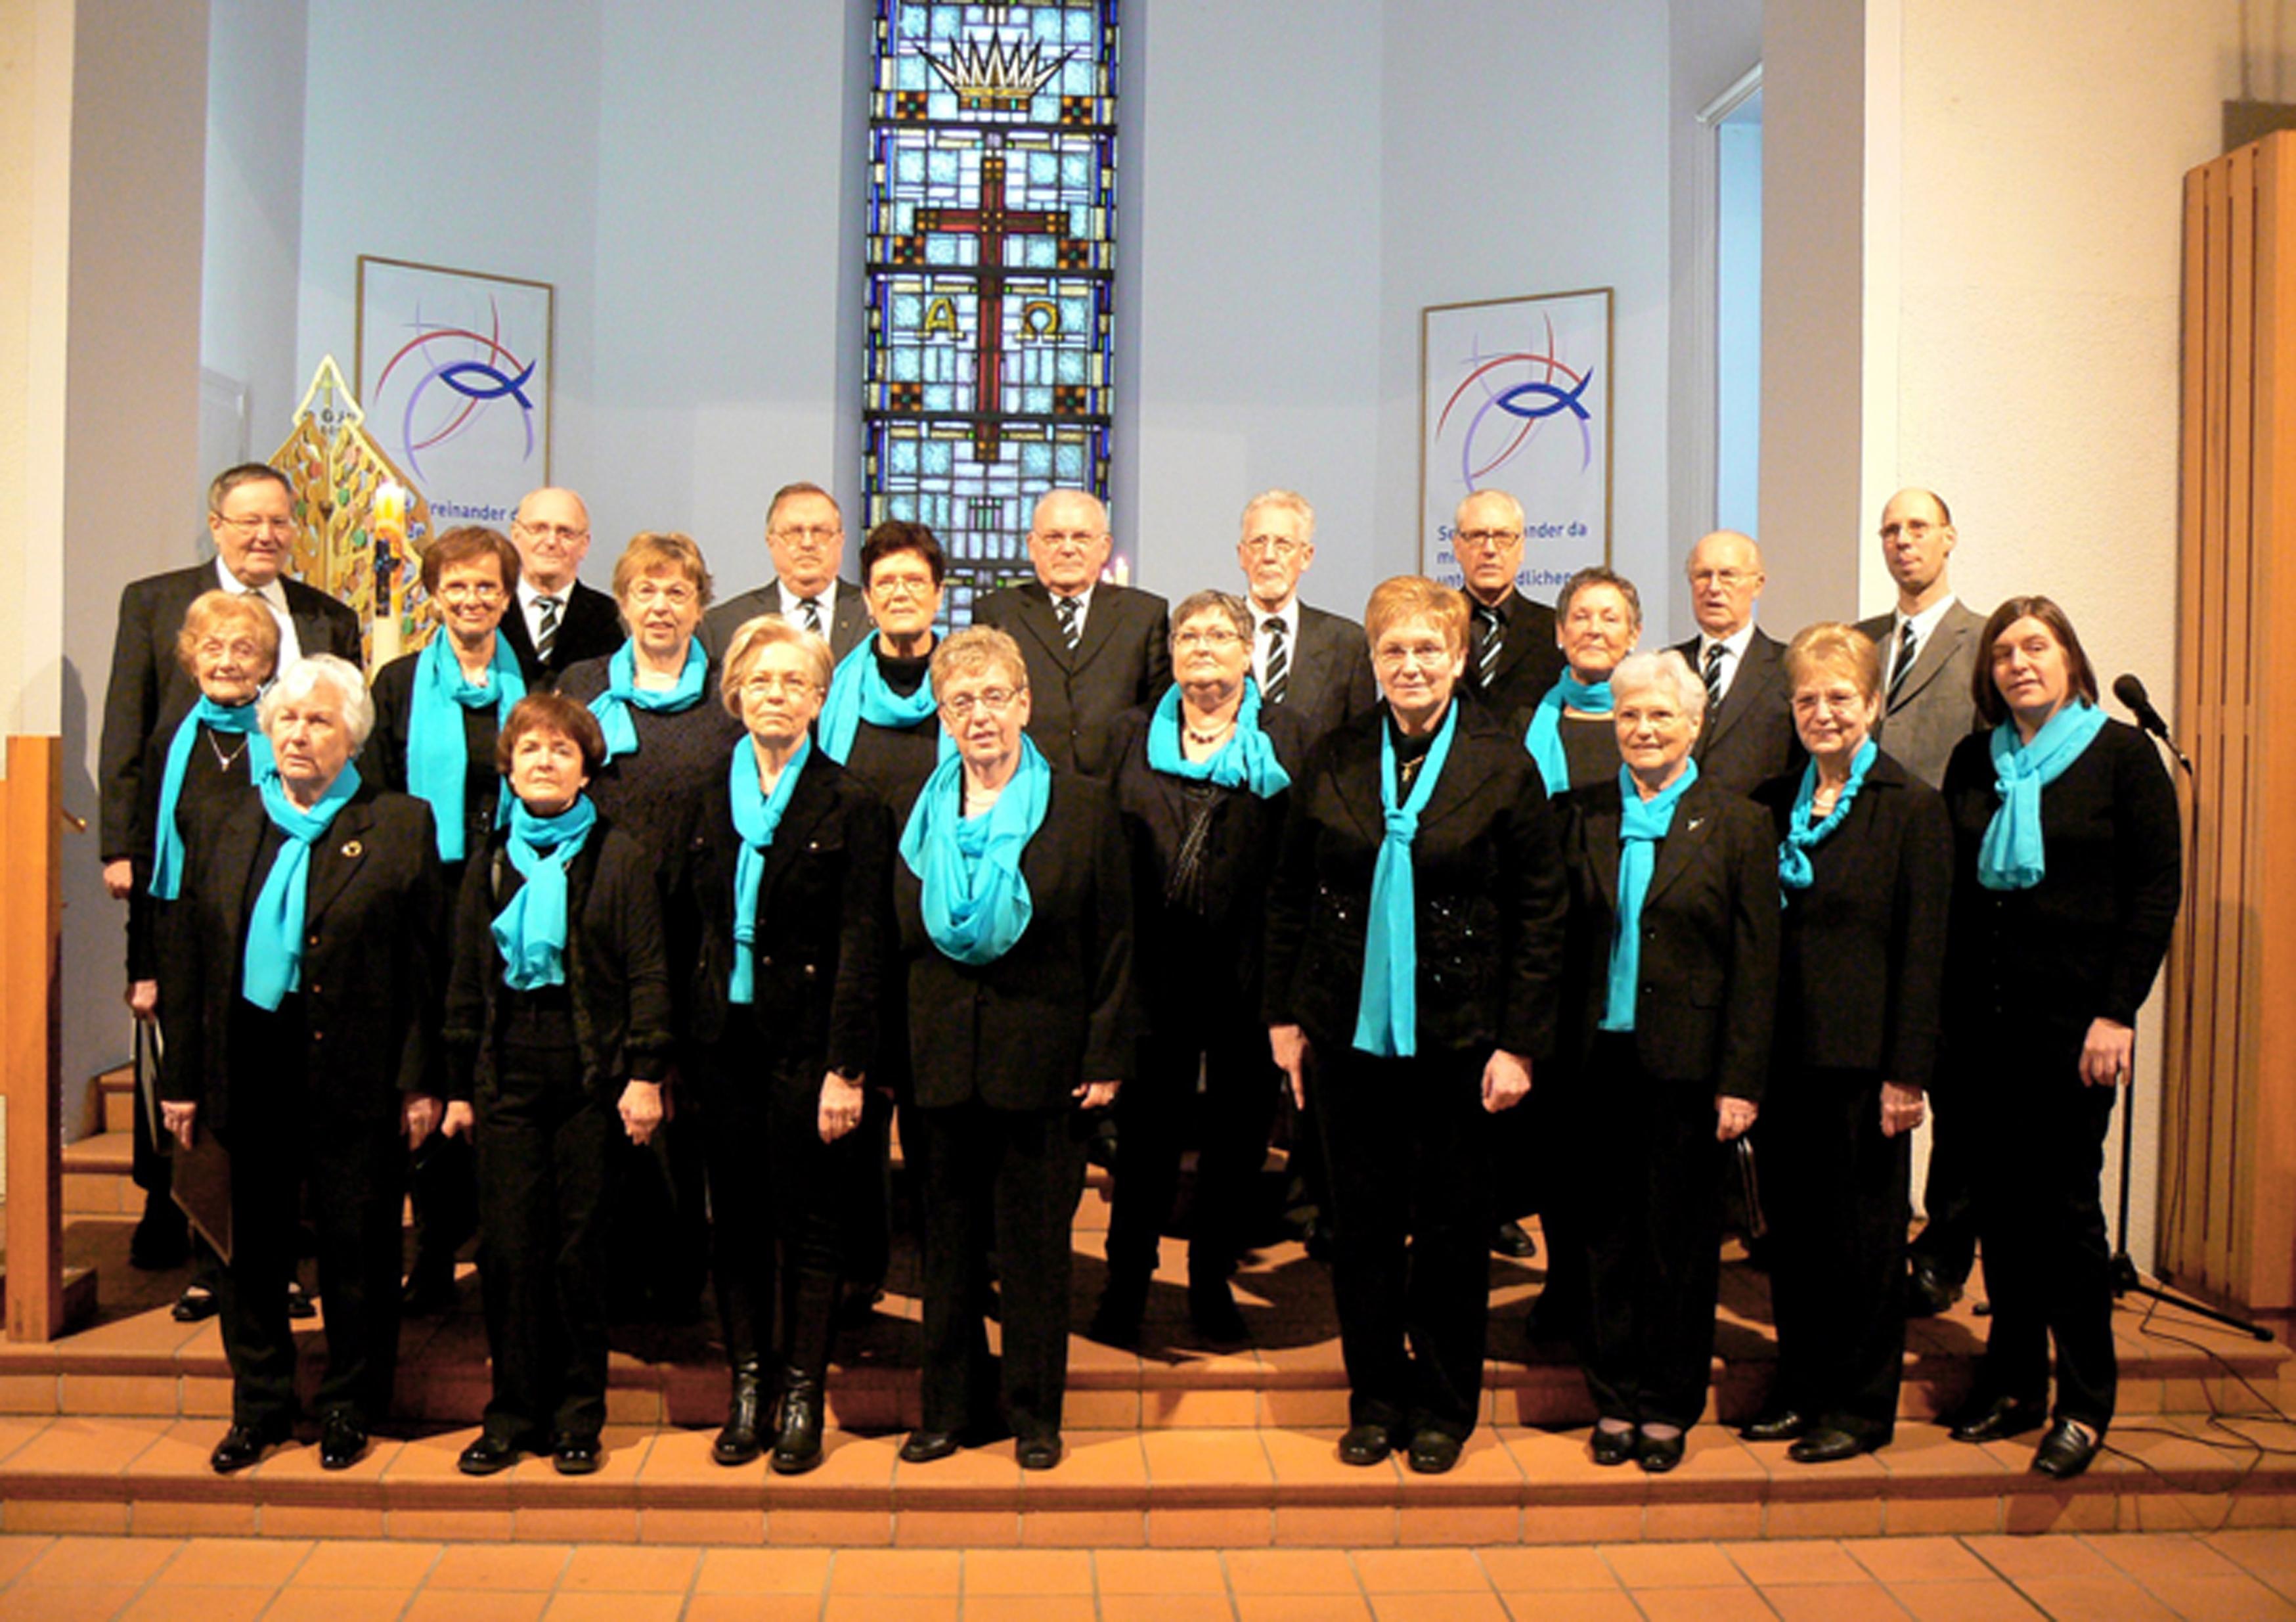 Unser Kirchenchor